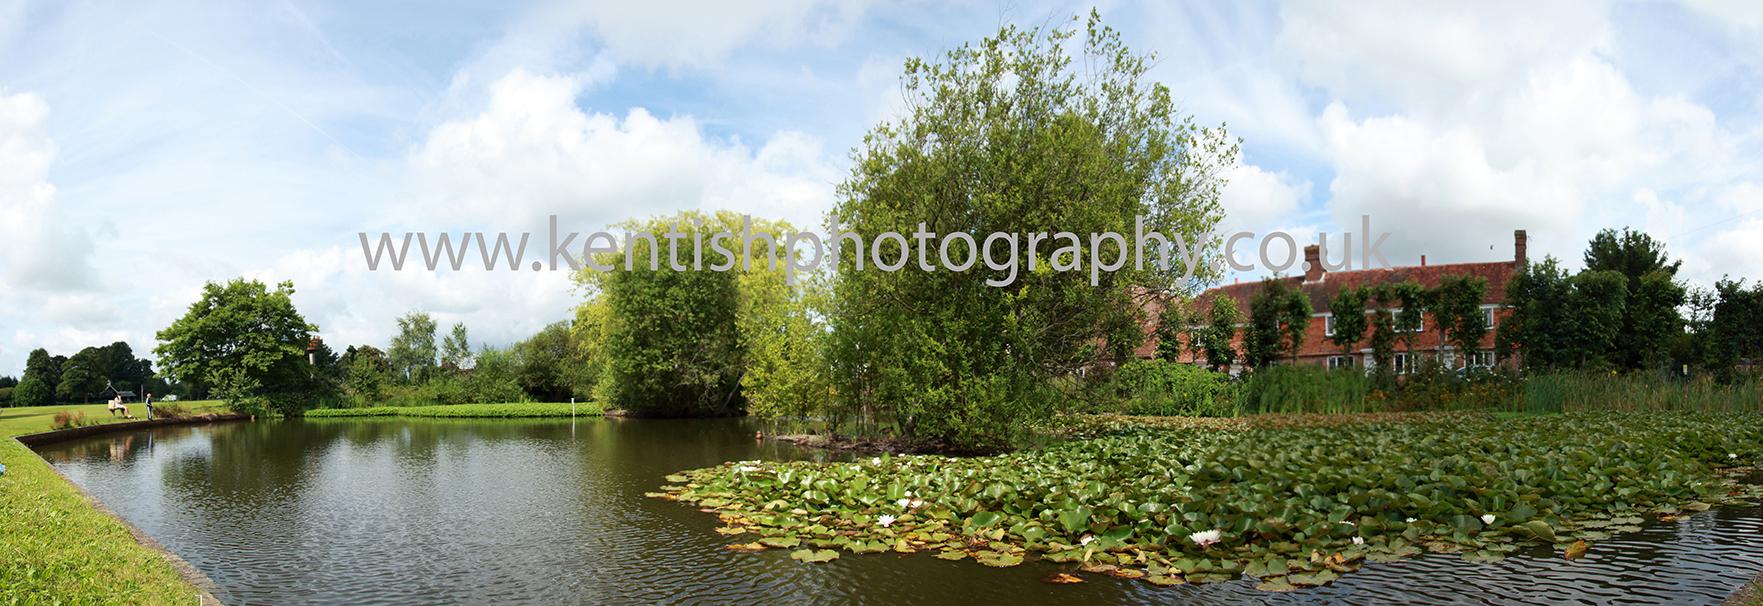 Matfield Pond